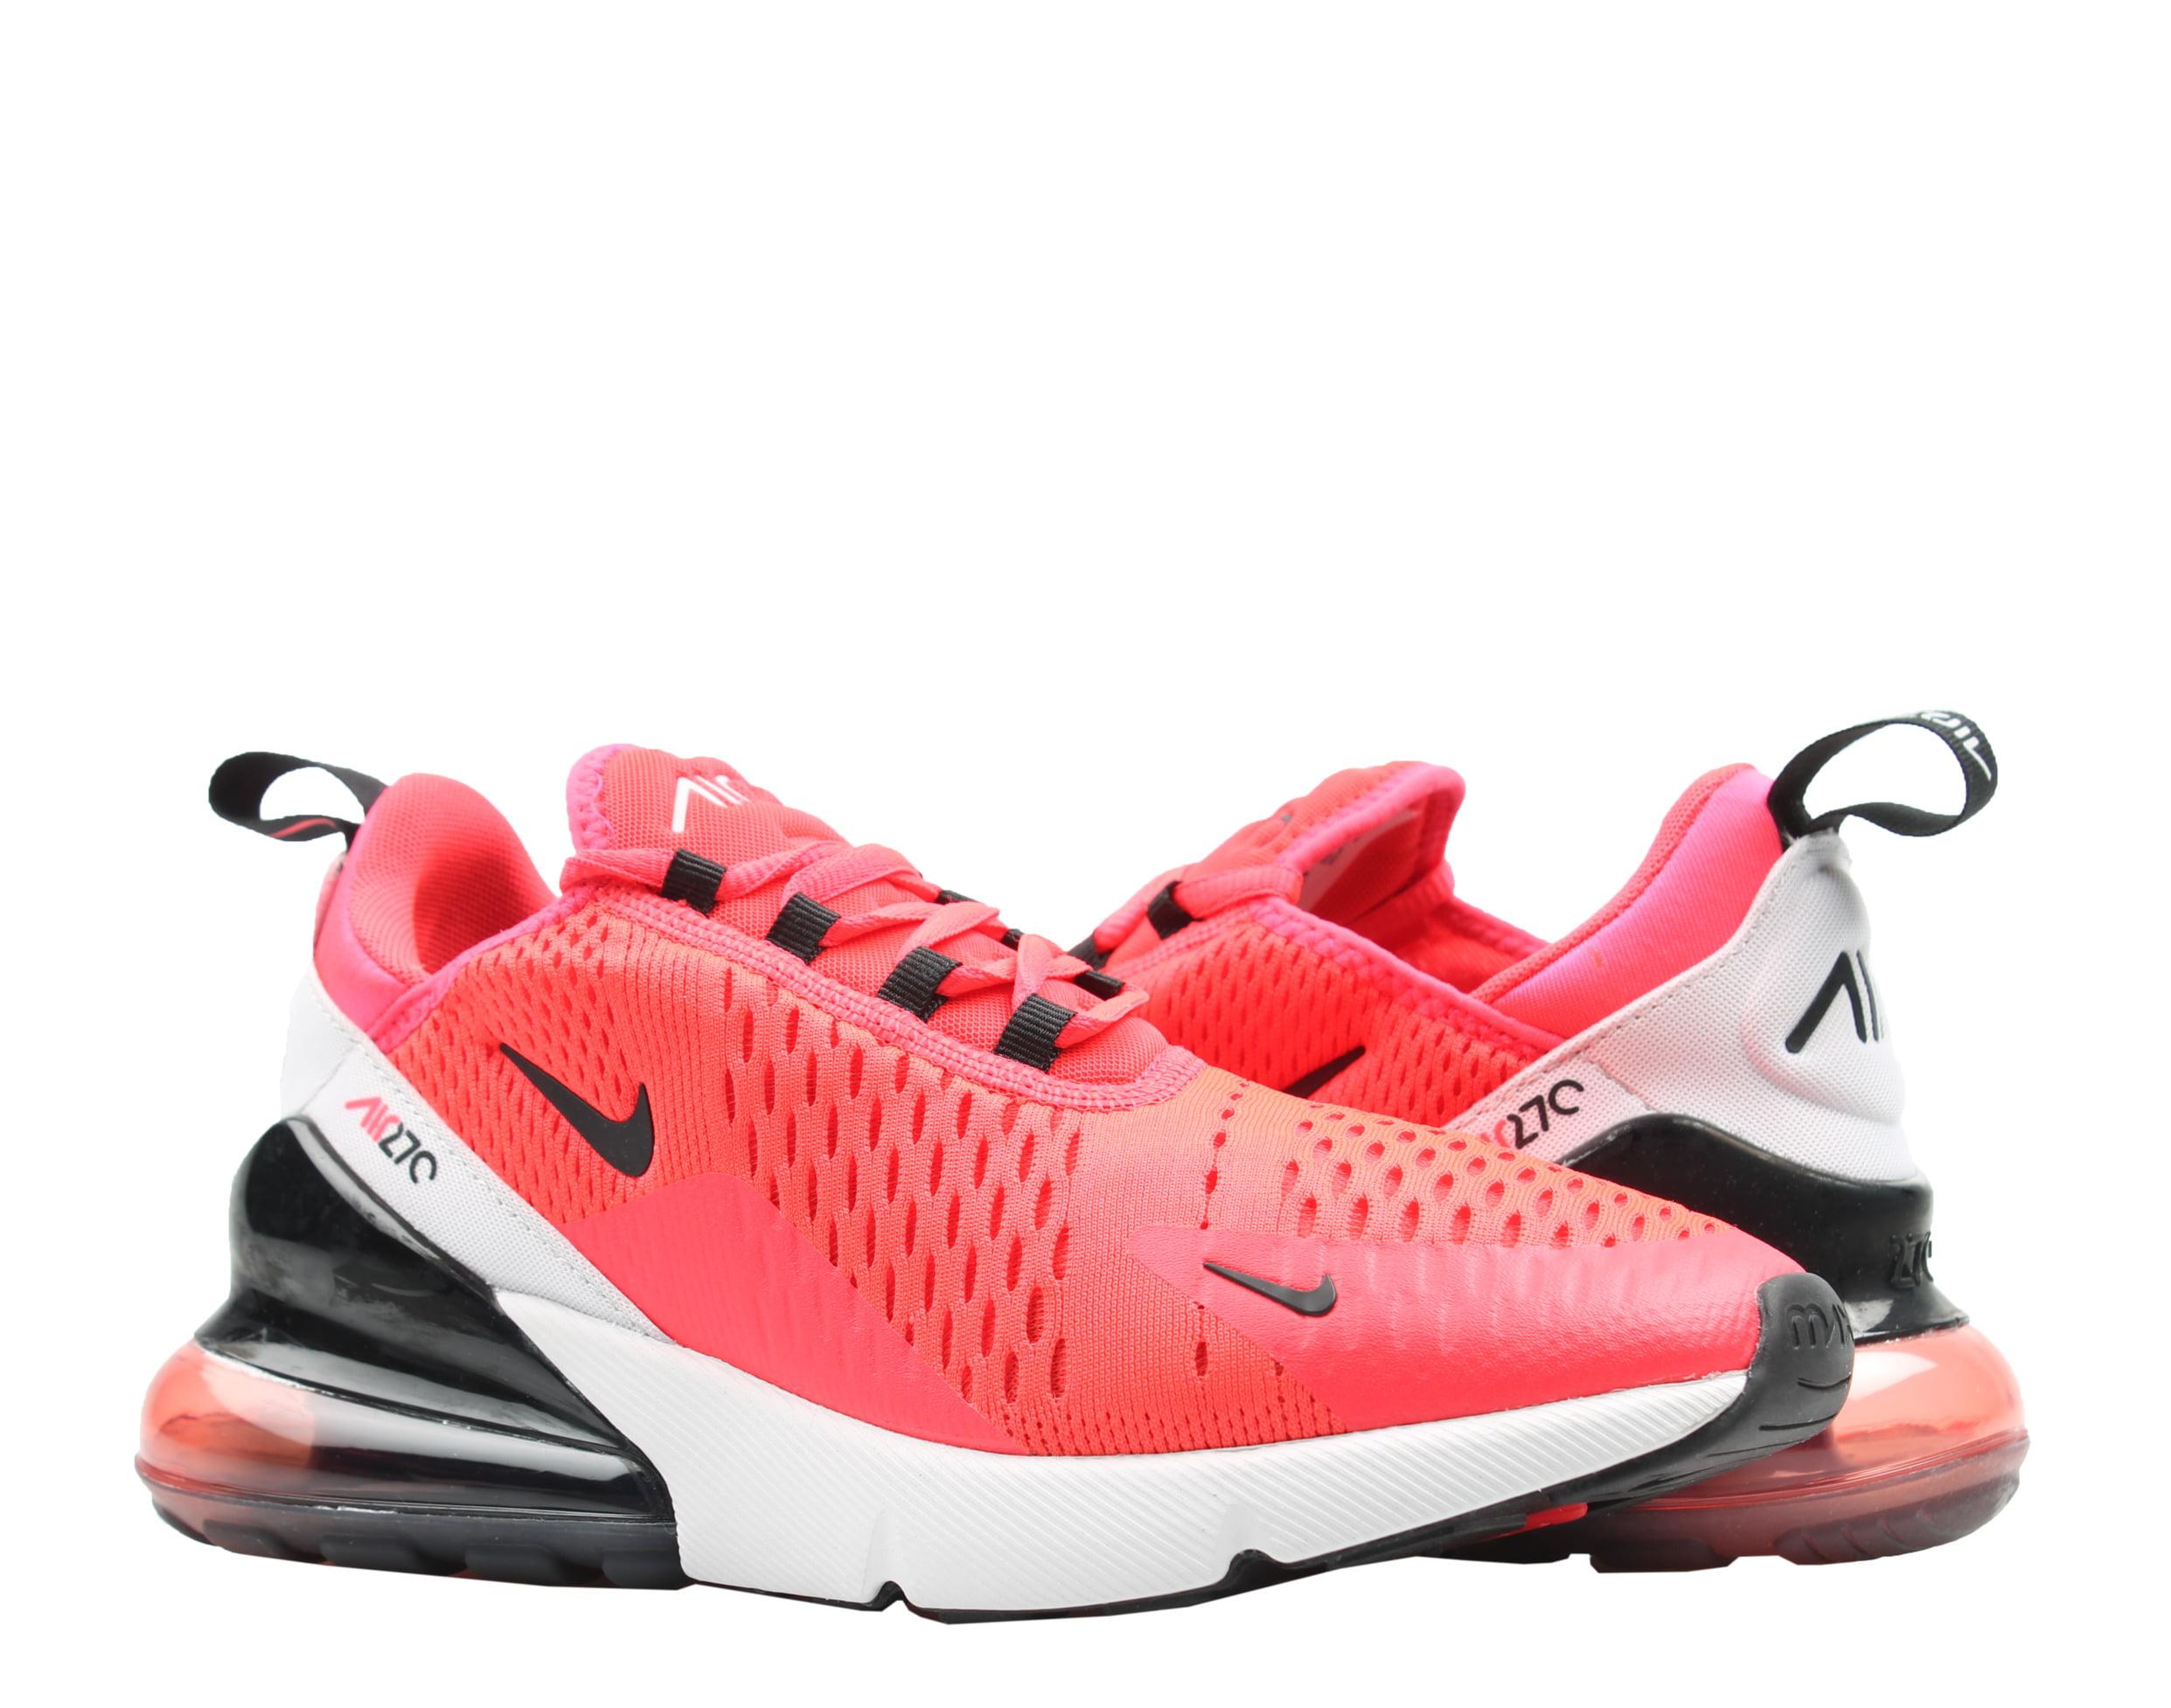 Nike - Nike Air Max 270 Red Orbit/Black-Vast Grey Men's Lifestyle Shoes BV6078-600 - Walmart.com